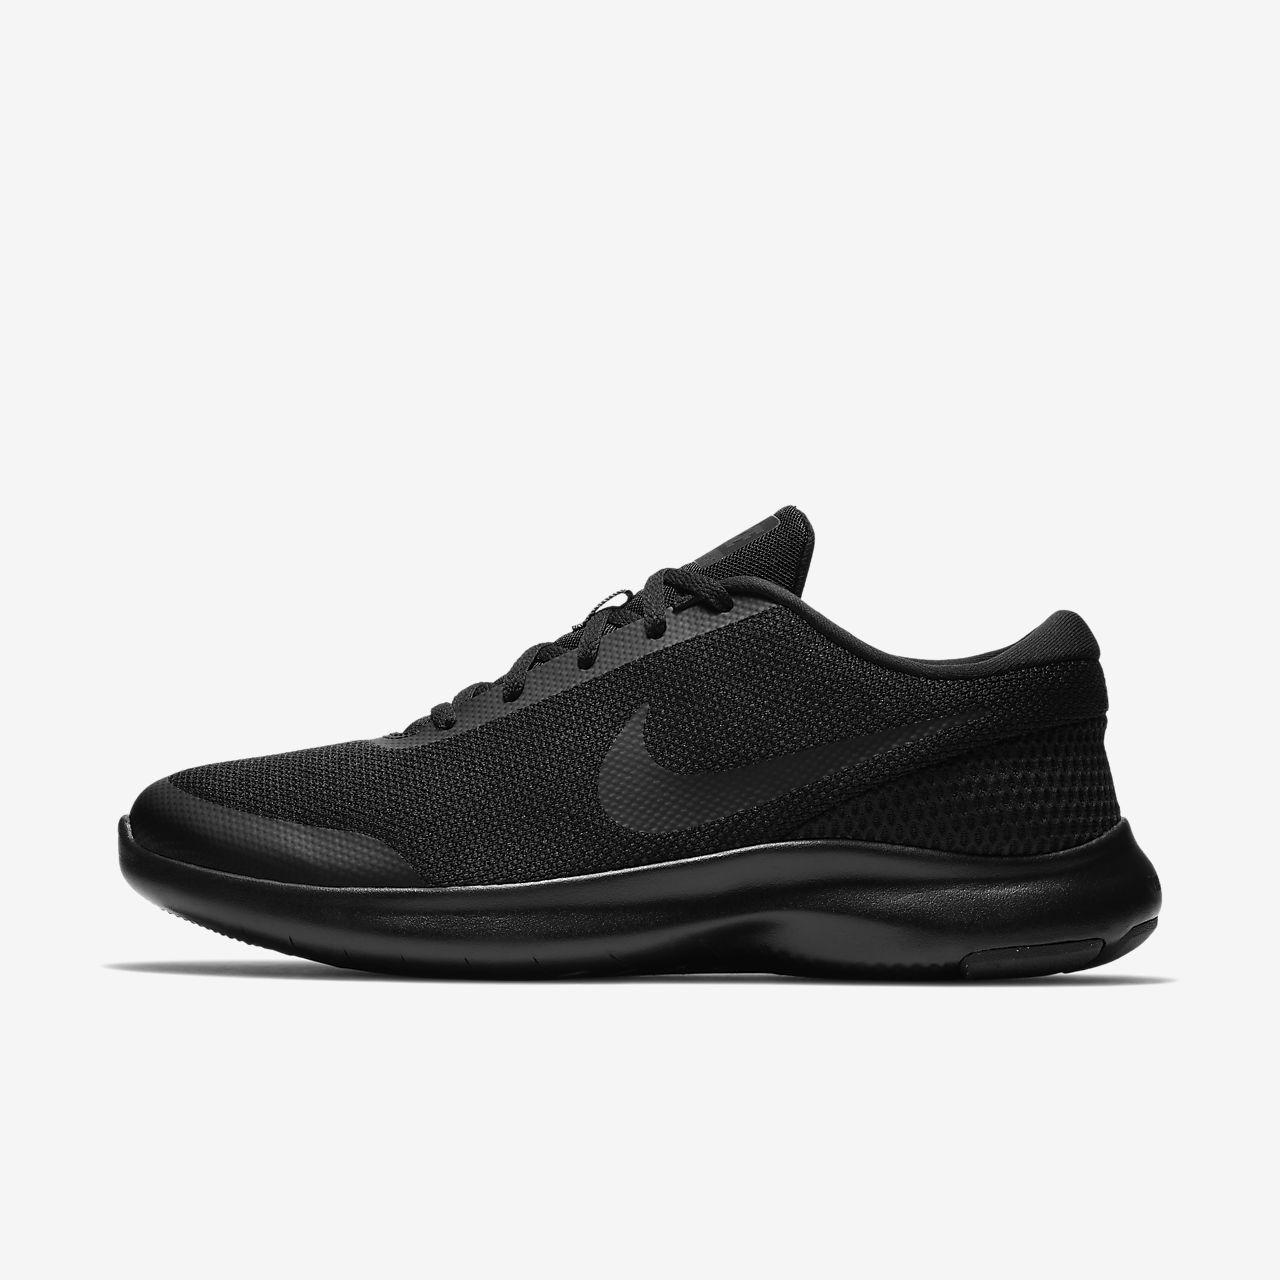 74ce2de369ae44 Nike Flex Experience Rn 7 Men s Running Shoe (Extra-Wide) - 6 ...